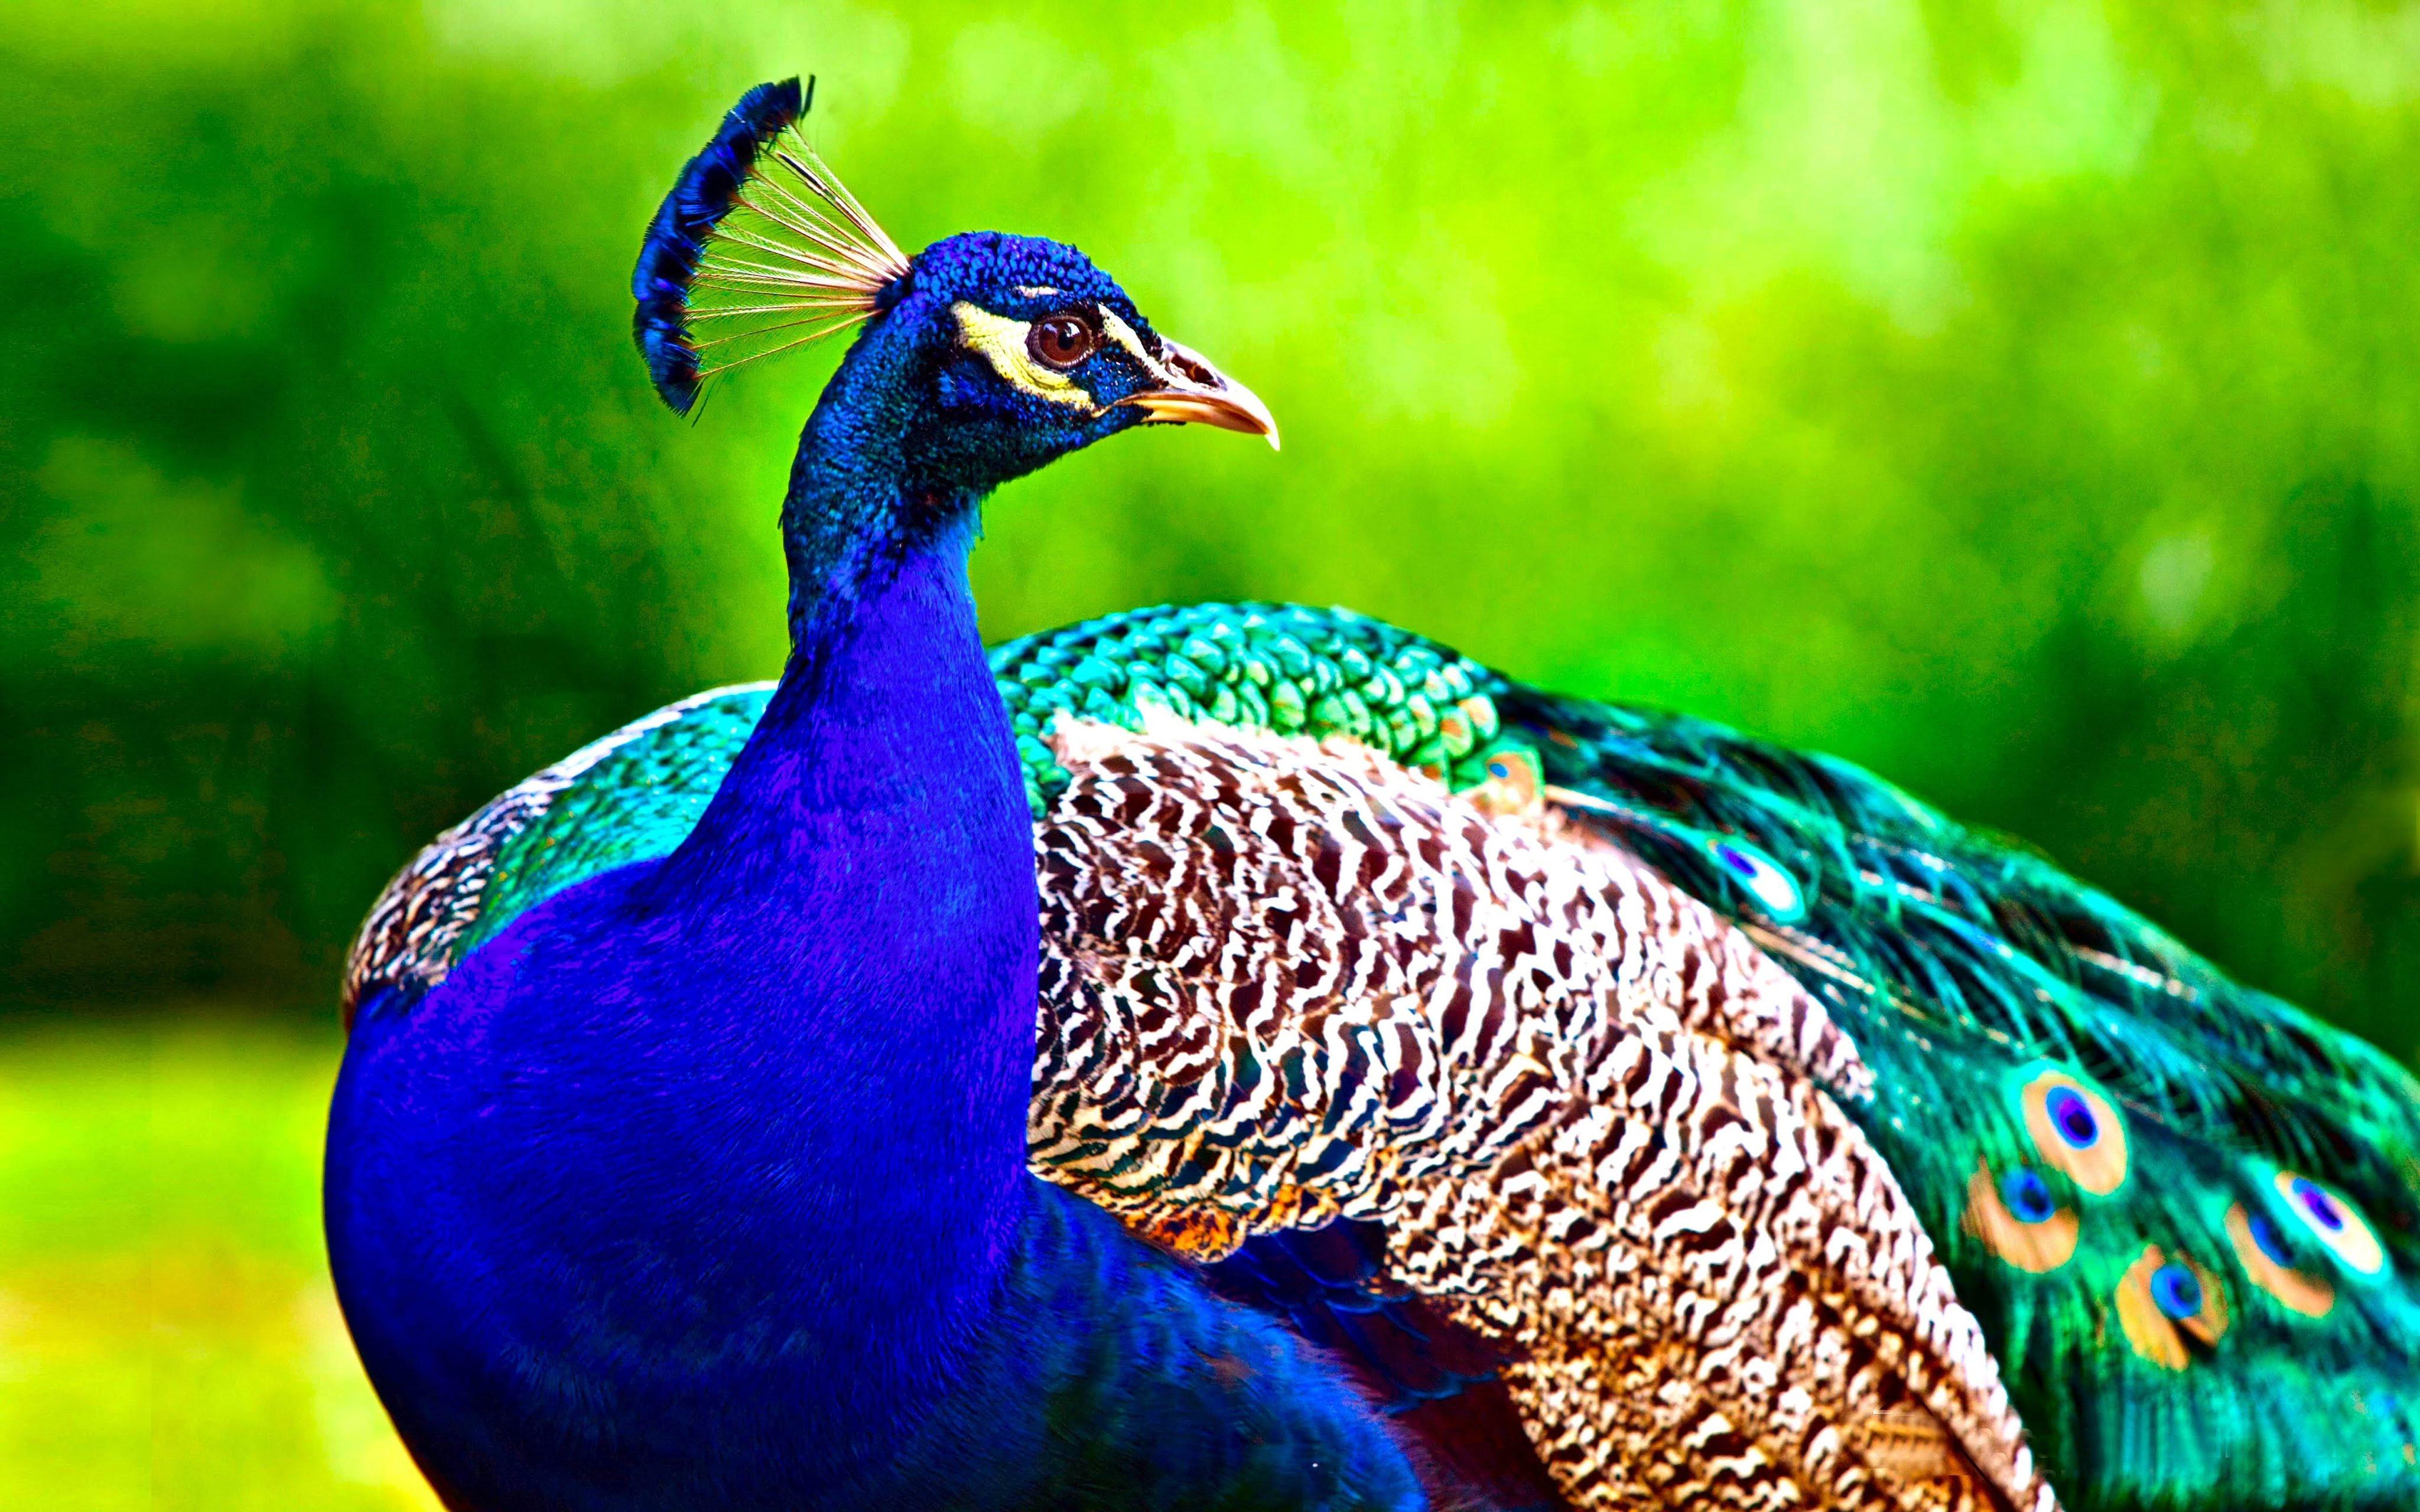 Peacock Full hd wallpapers